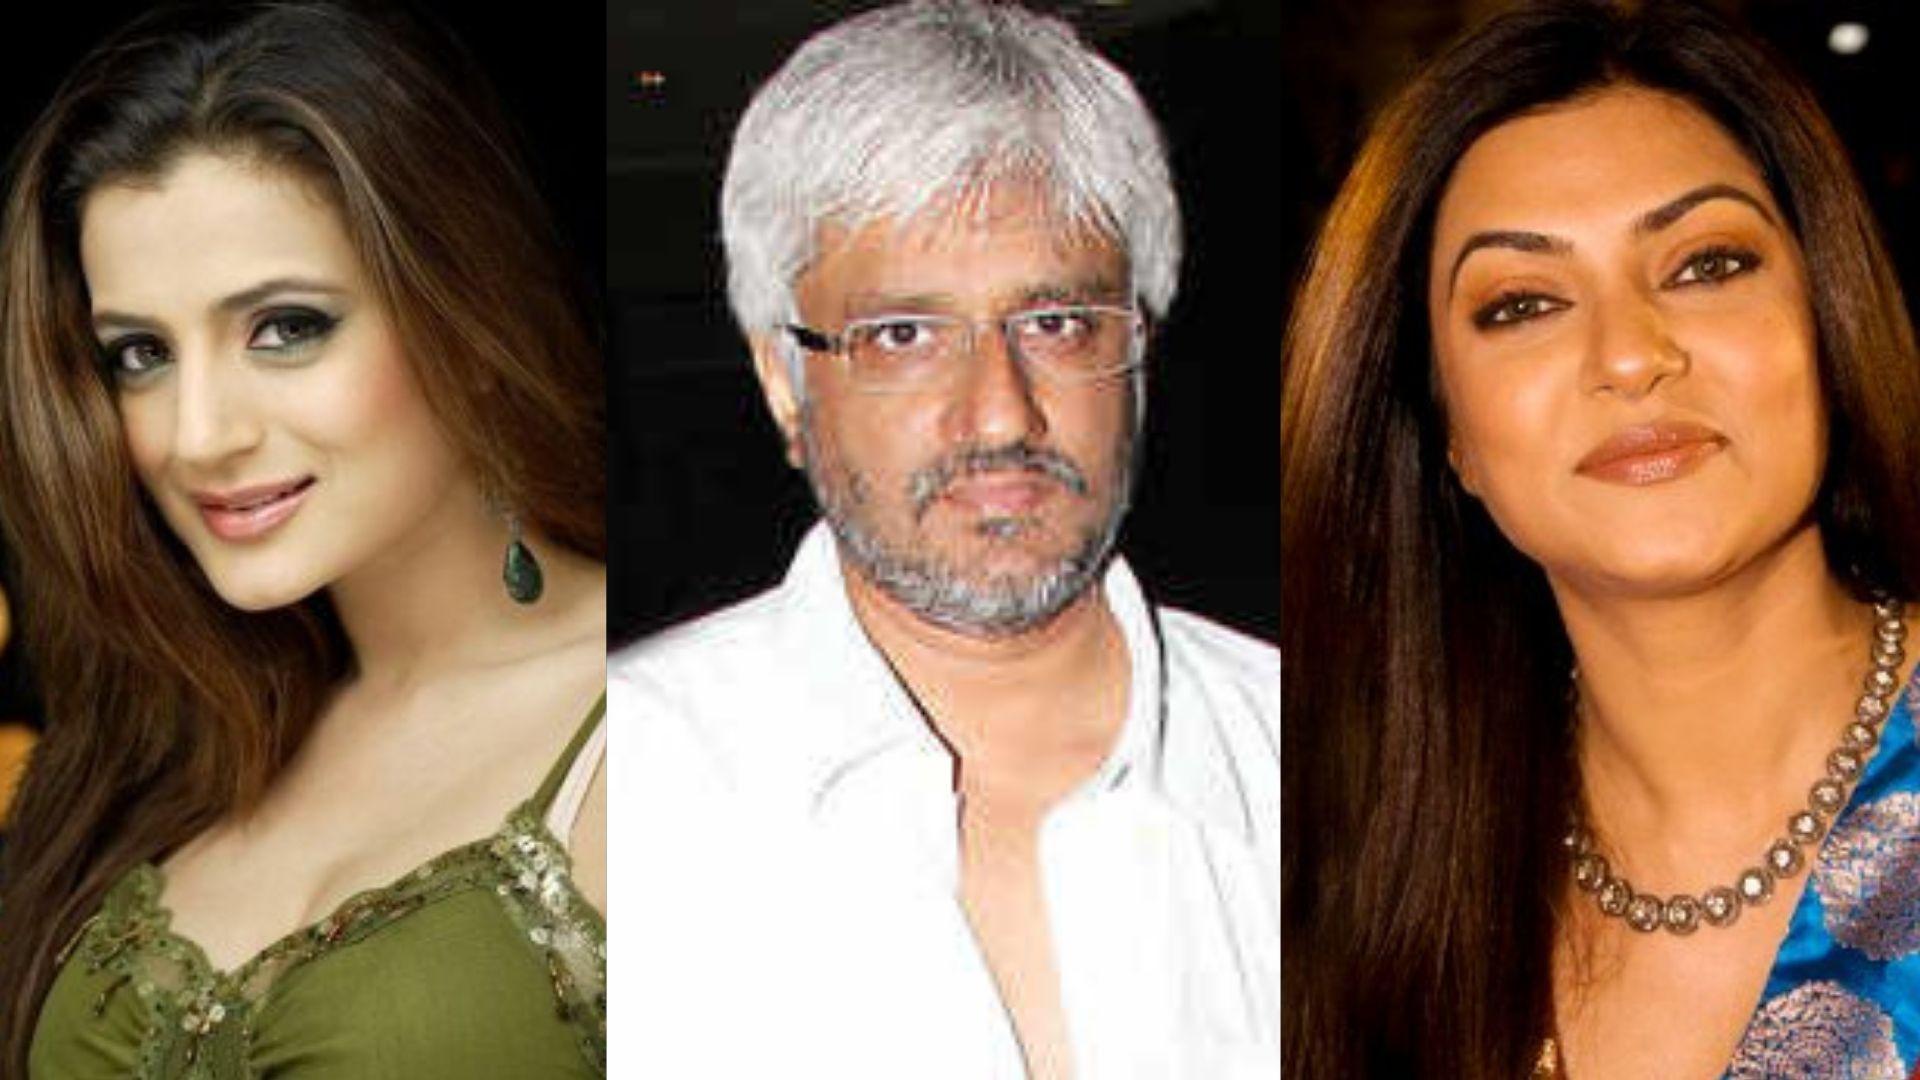 Secret BUSTED! After Dating Ameesha Patel And Sushmita Sen, Filmmaker Vikram Bhatt Secretly Marries The Love Of His Life Last Year